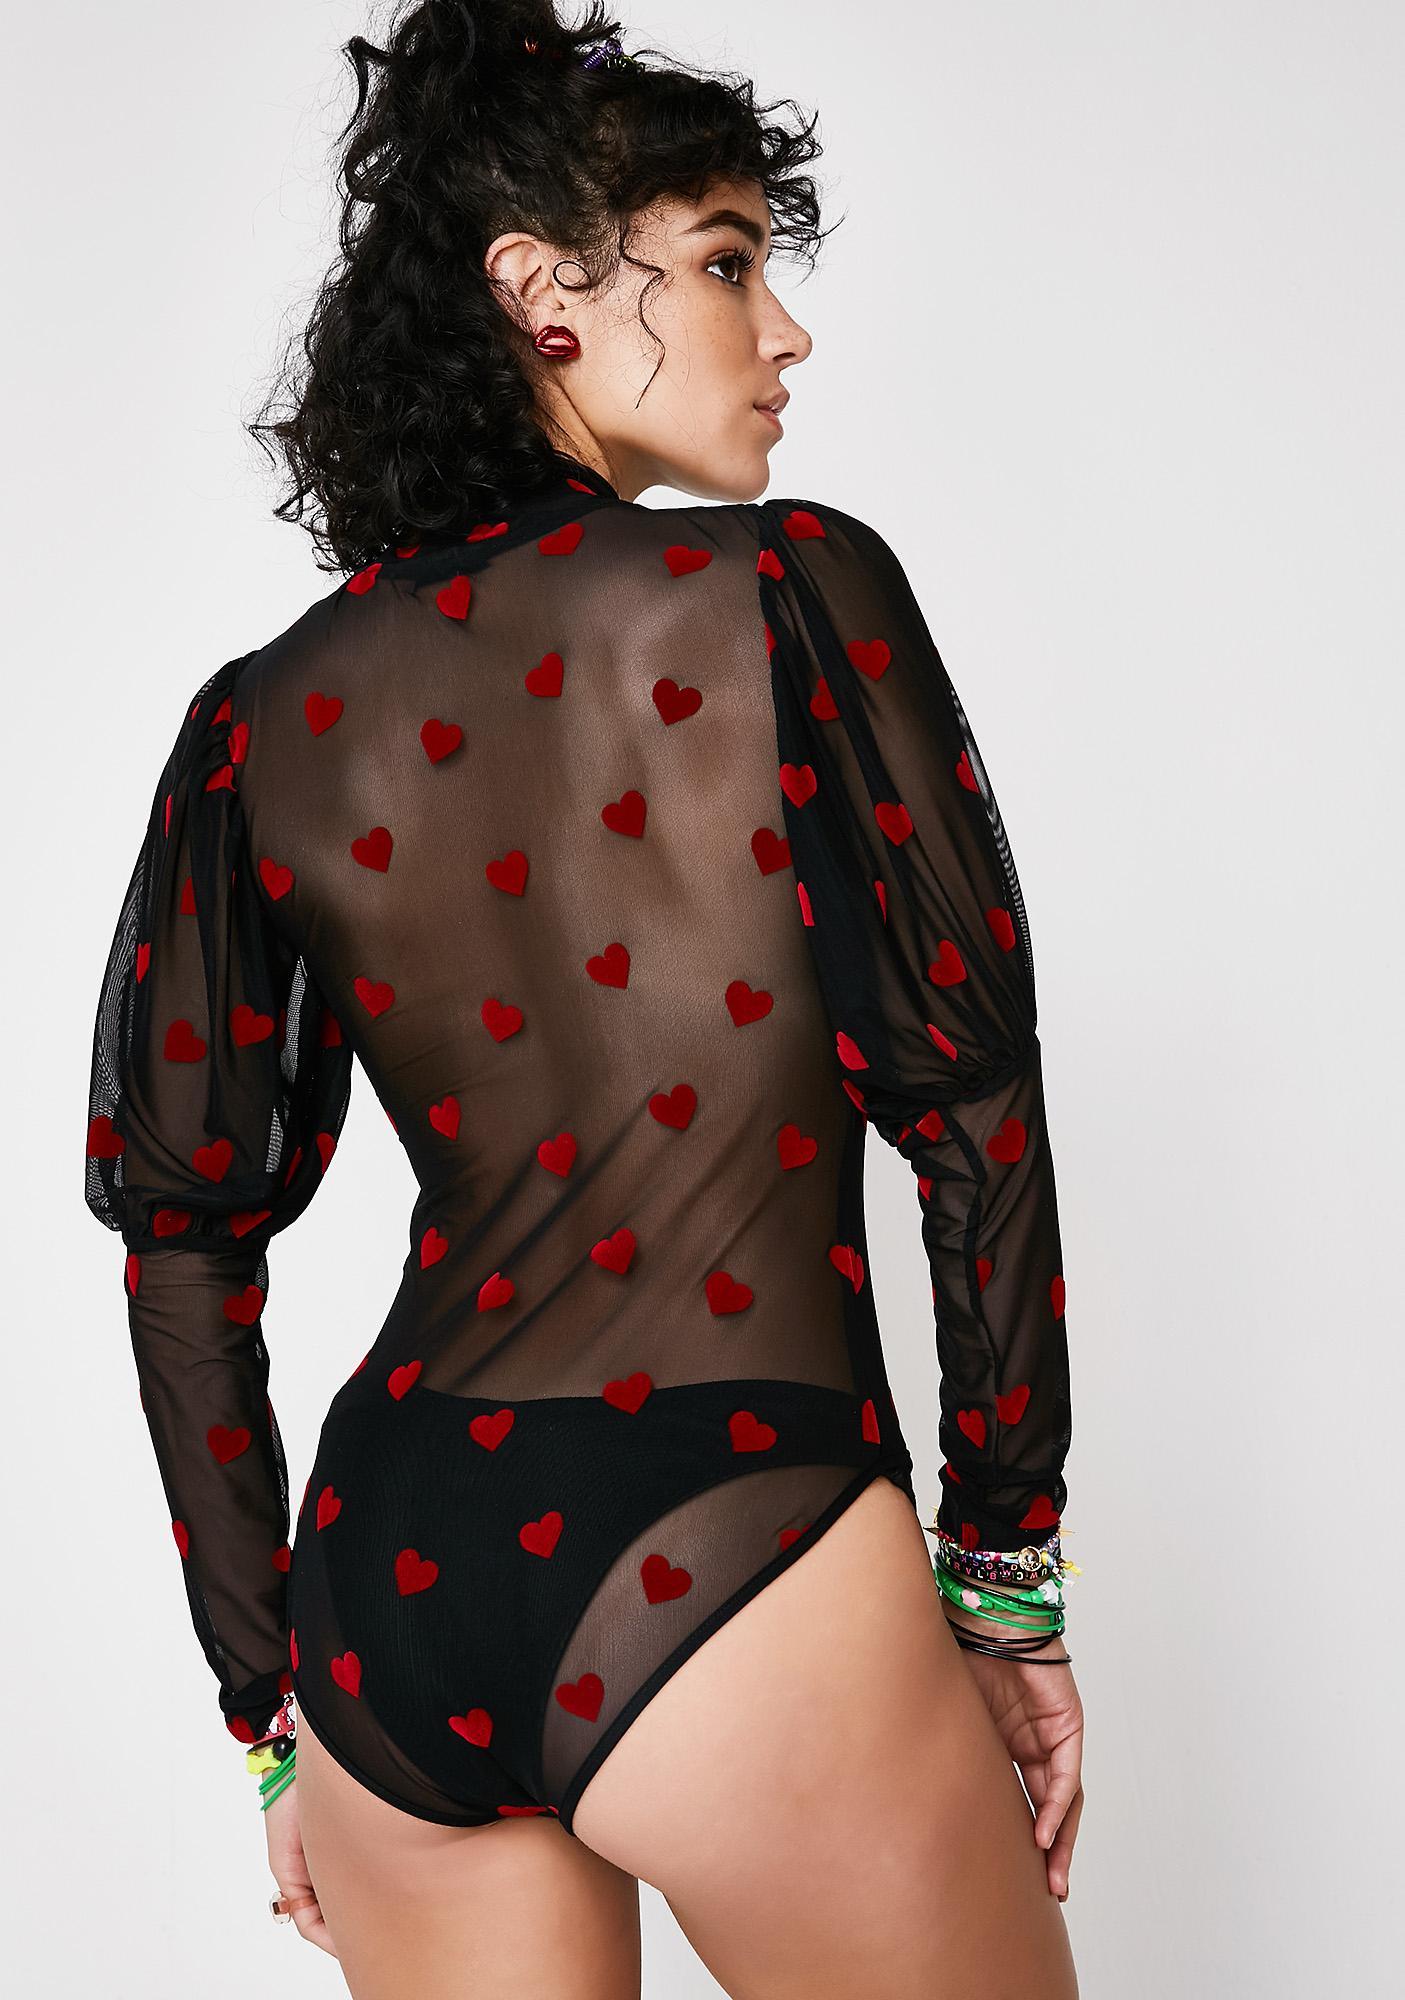 Lazy Oaf Sheer Romance Bodysuit